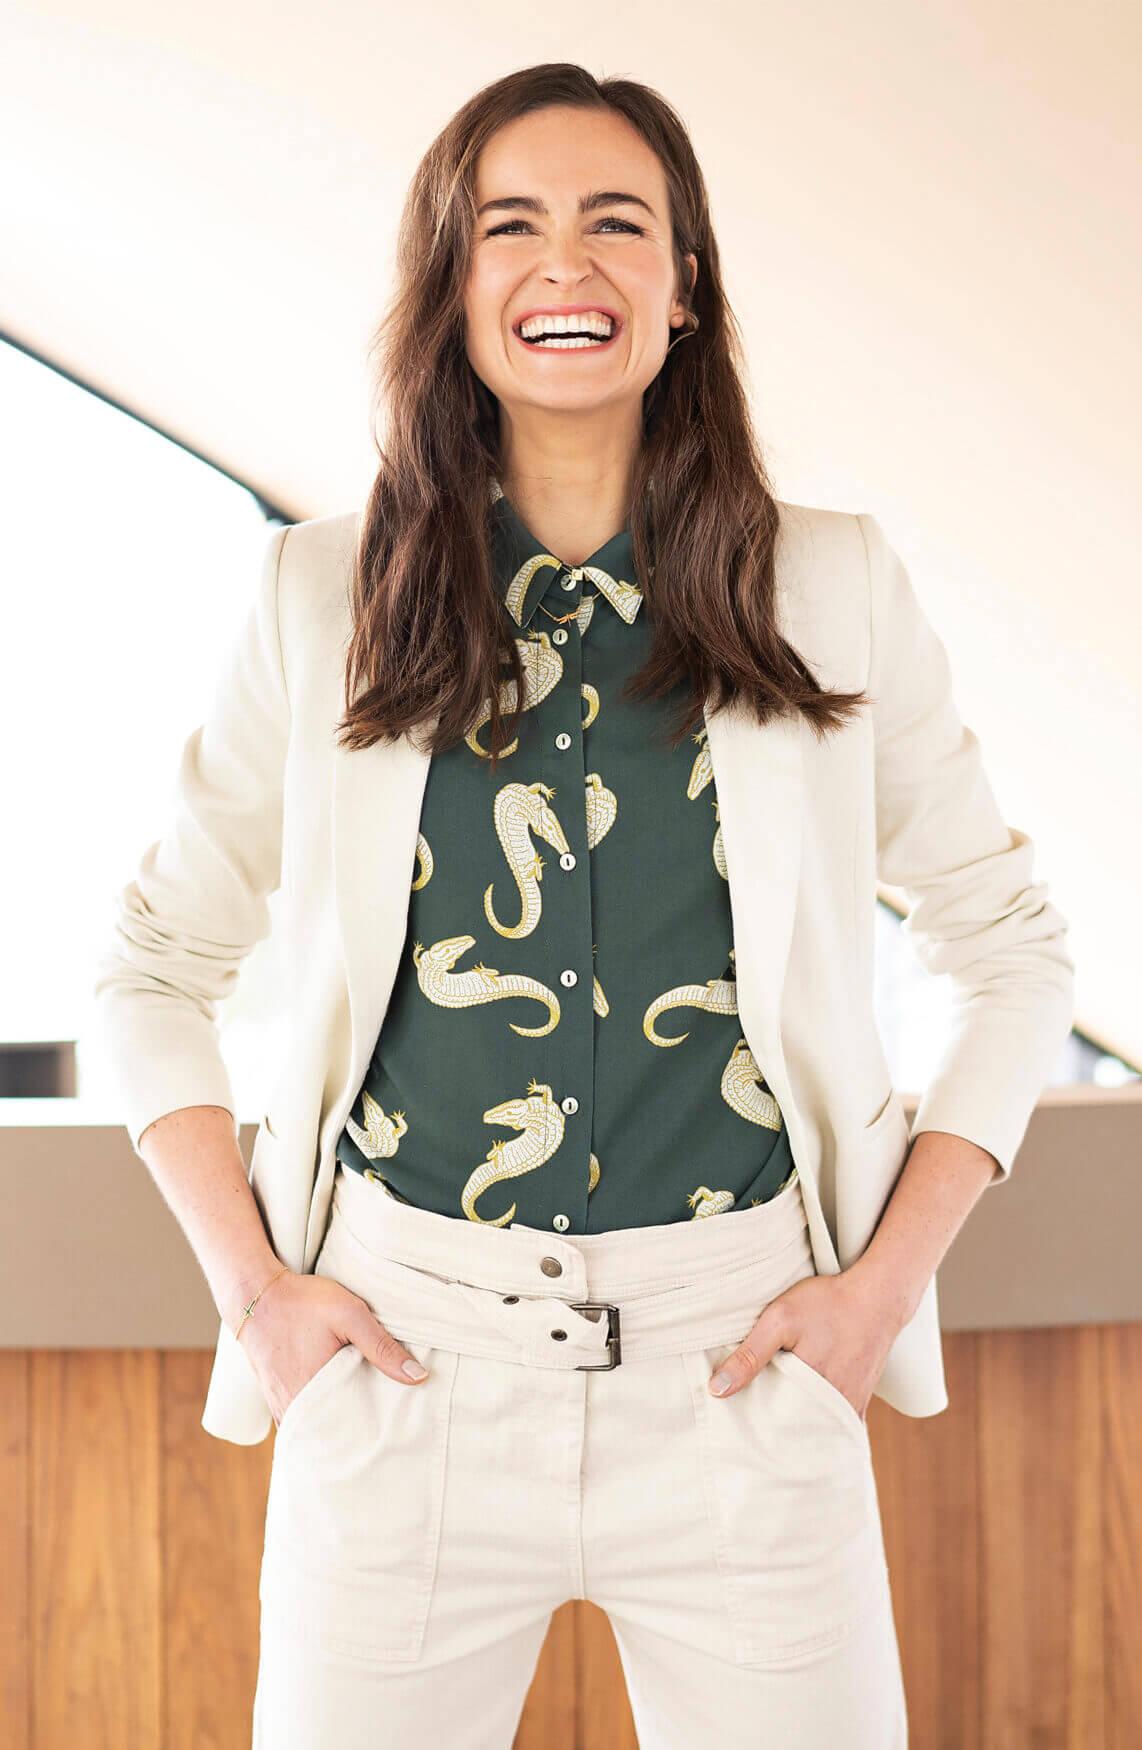 Anna Dames Blouse met croco print groen